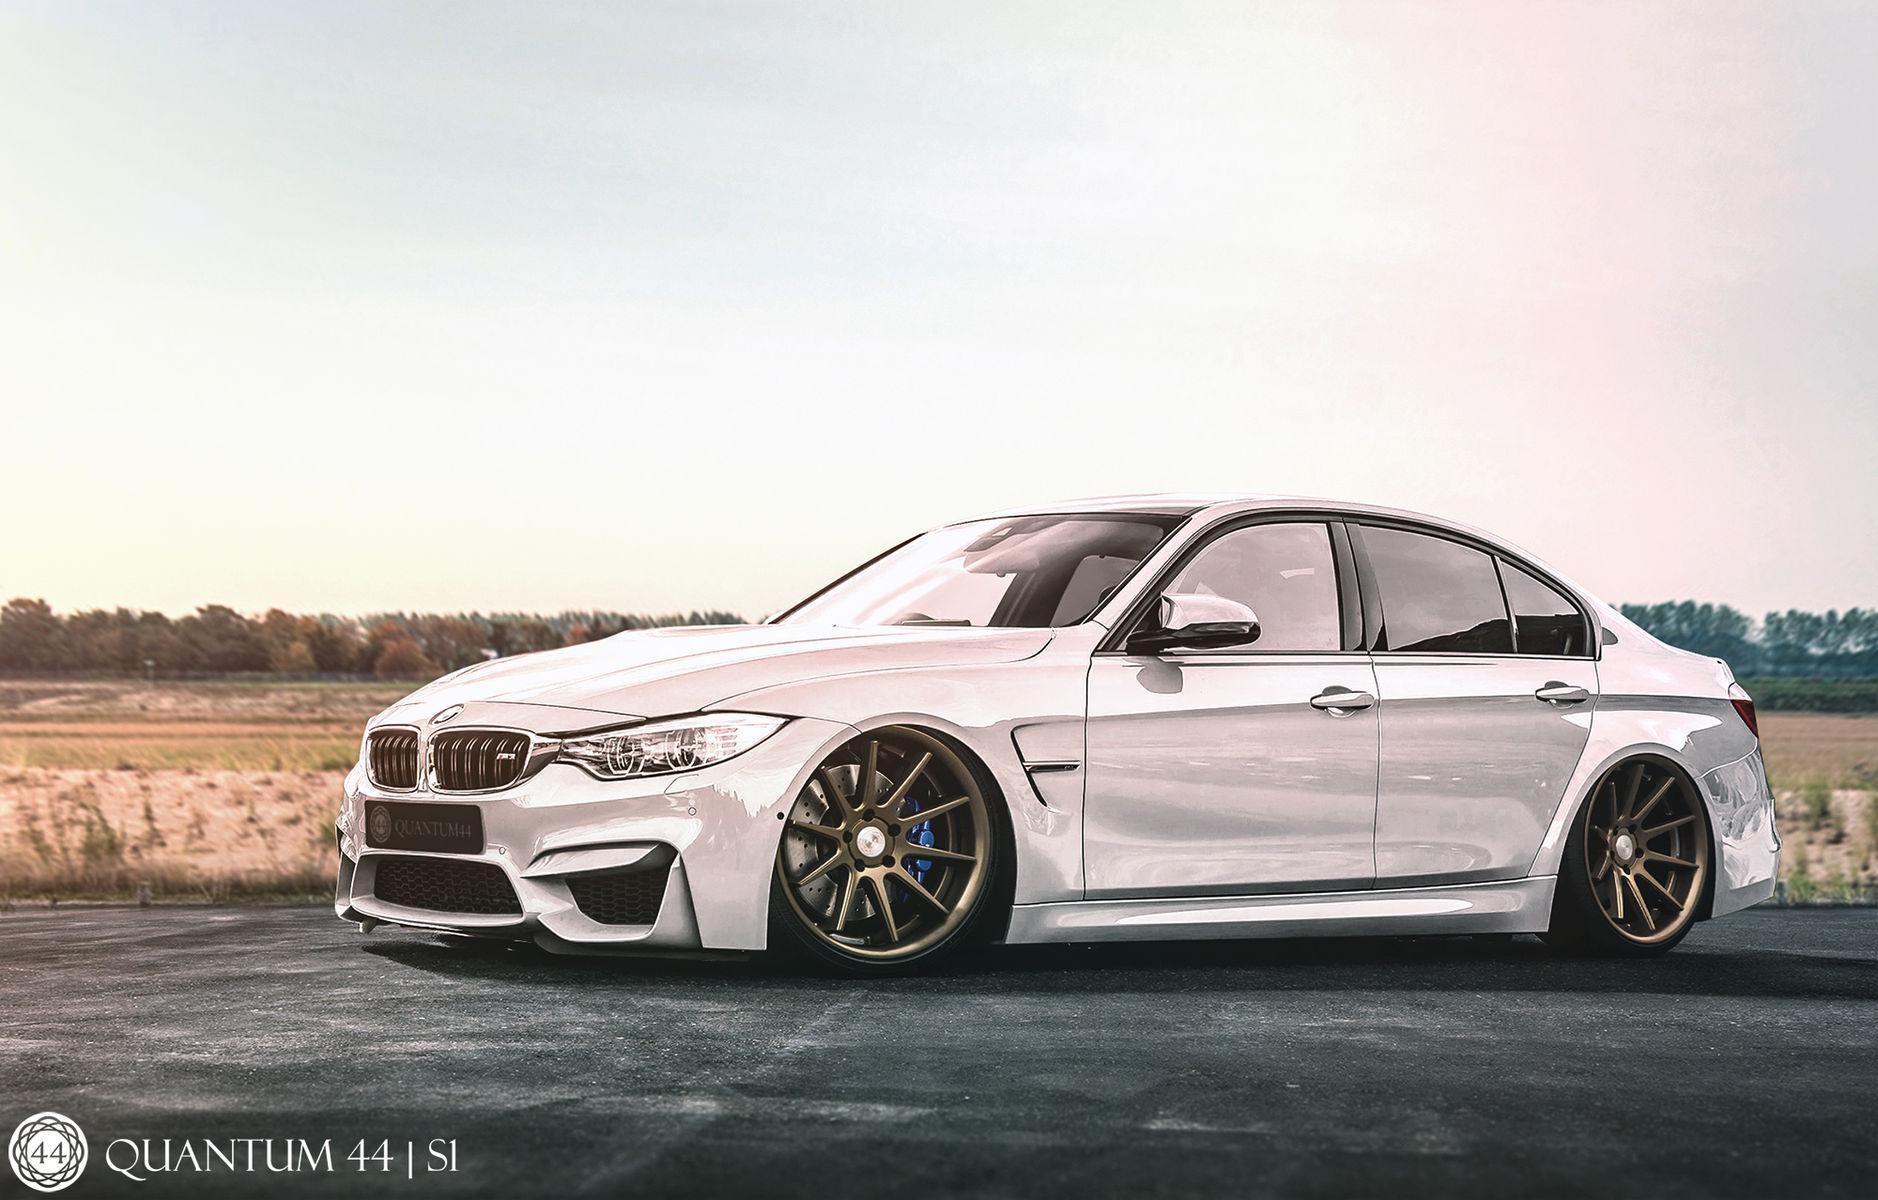 BMW M3   BMW M3 - Quantum44 S1